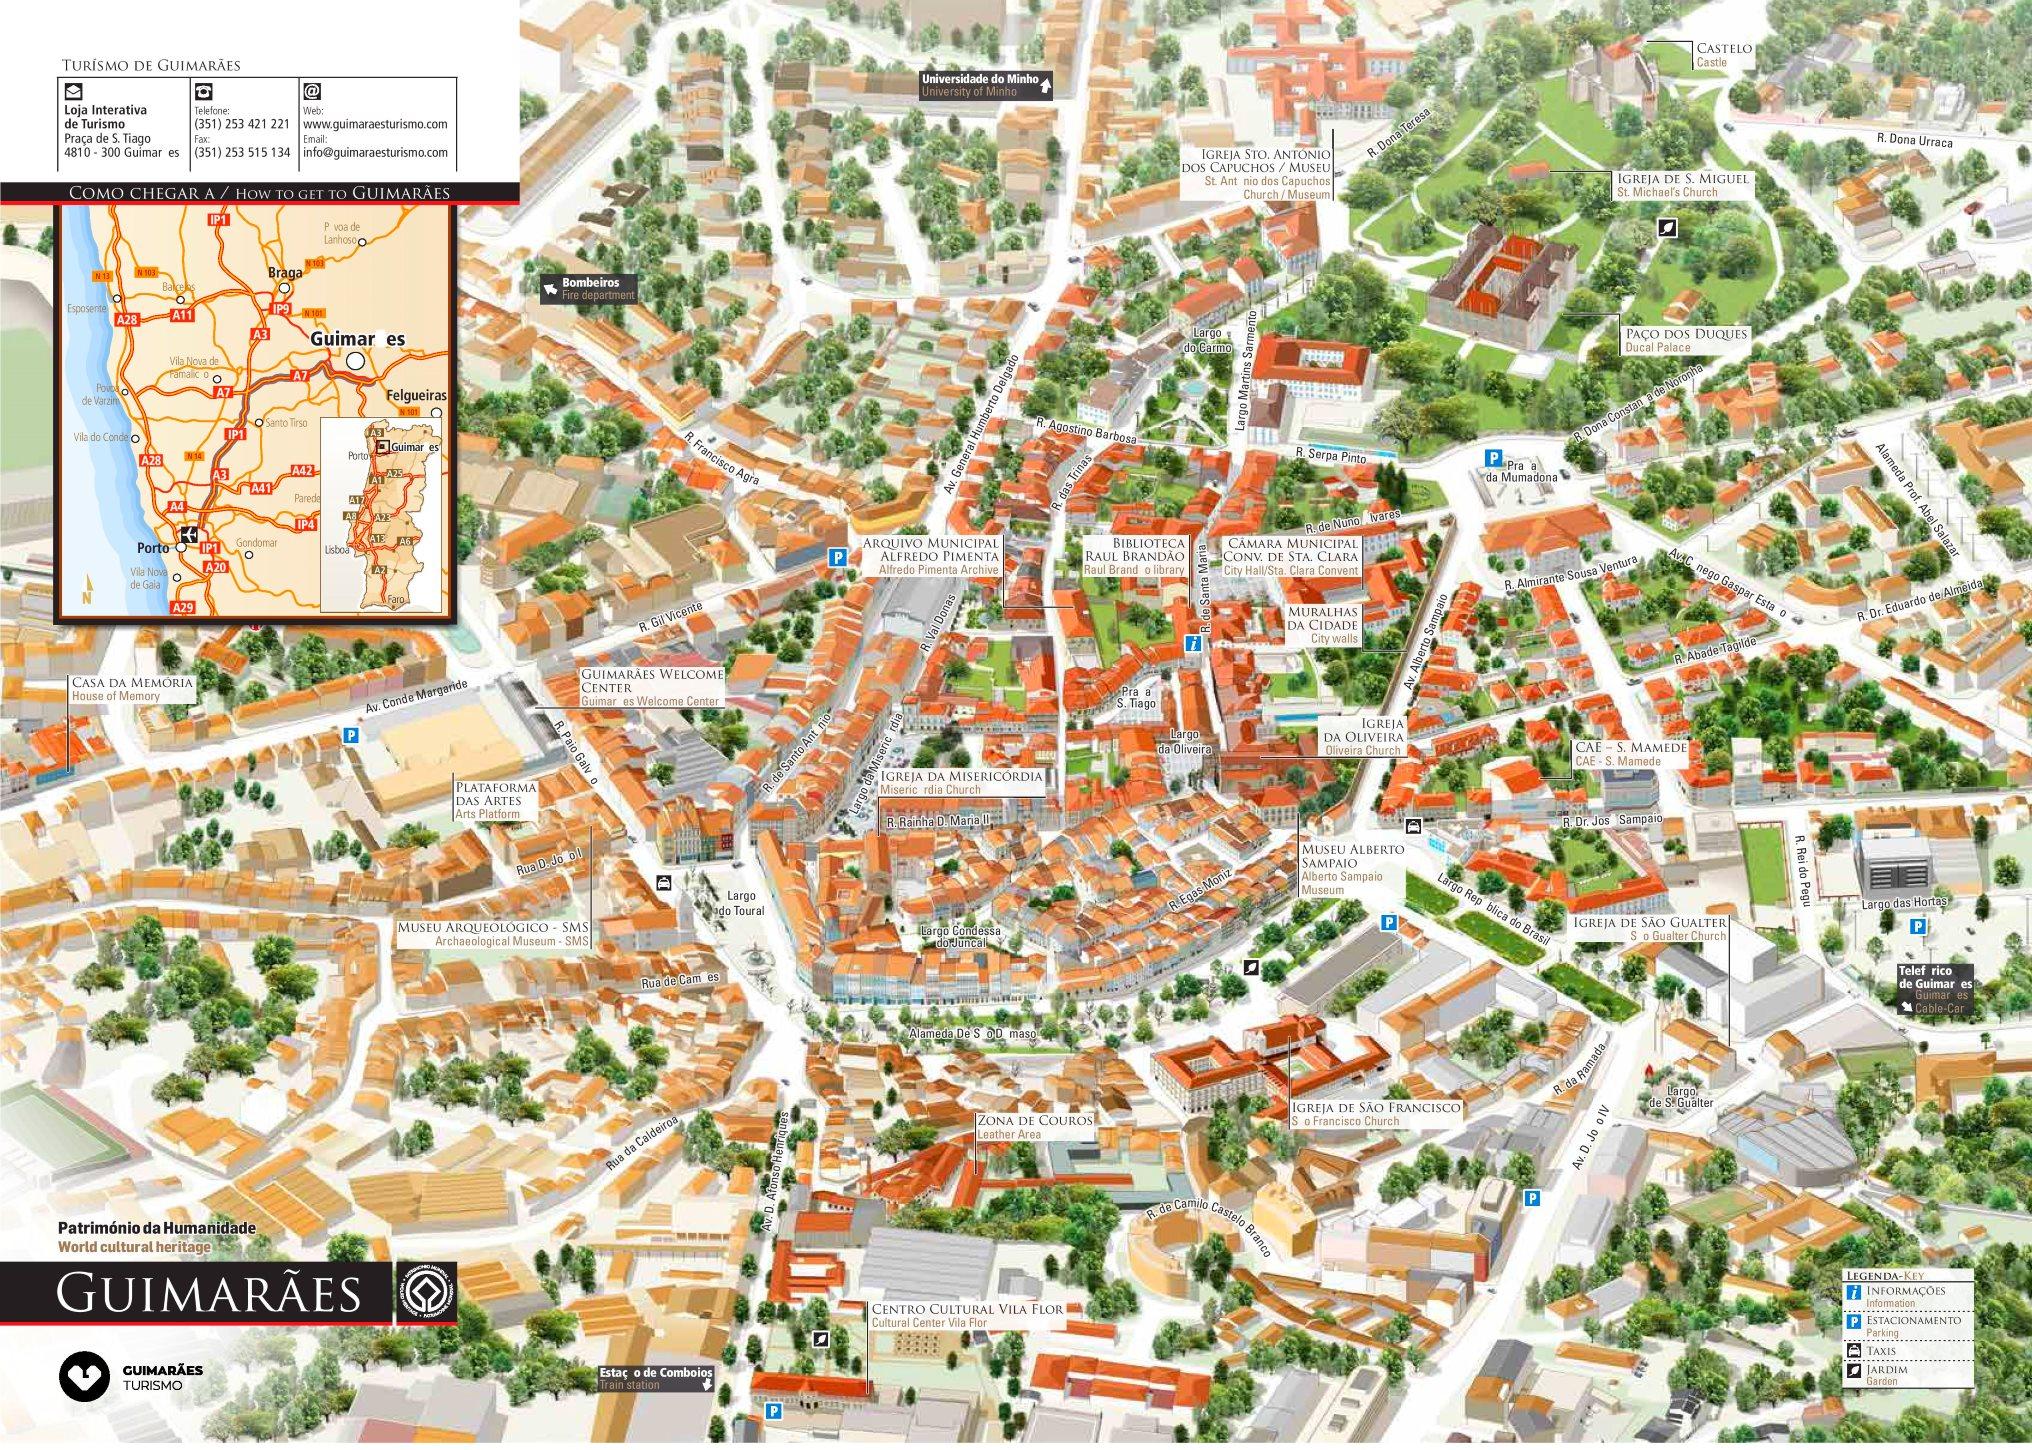 Guimarães tourist map